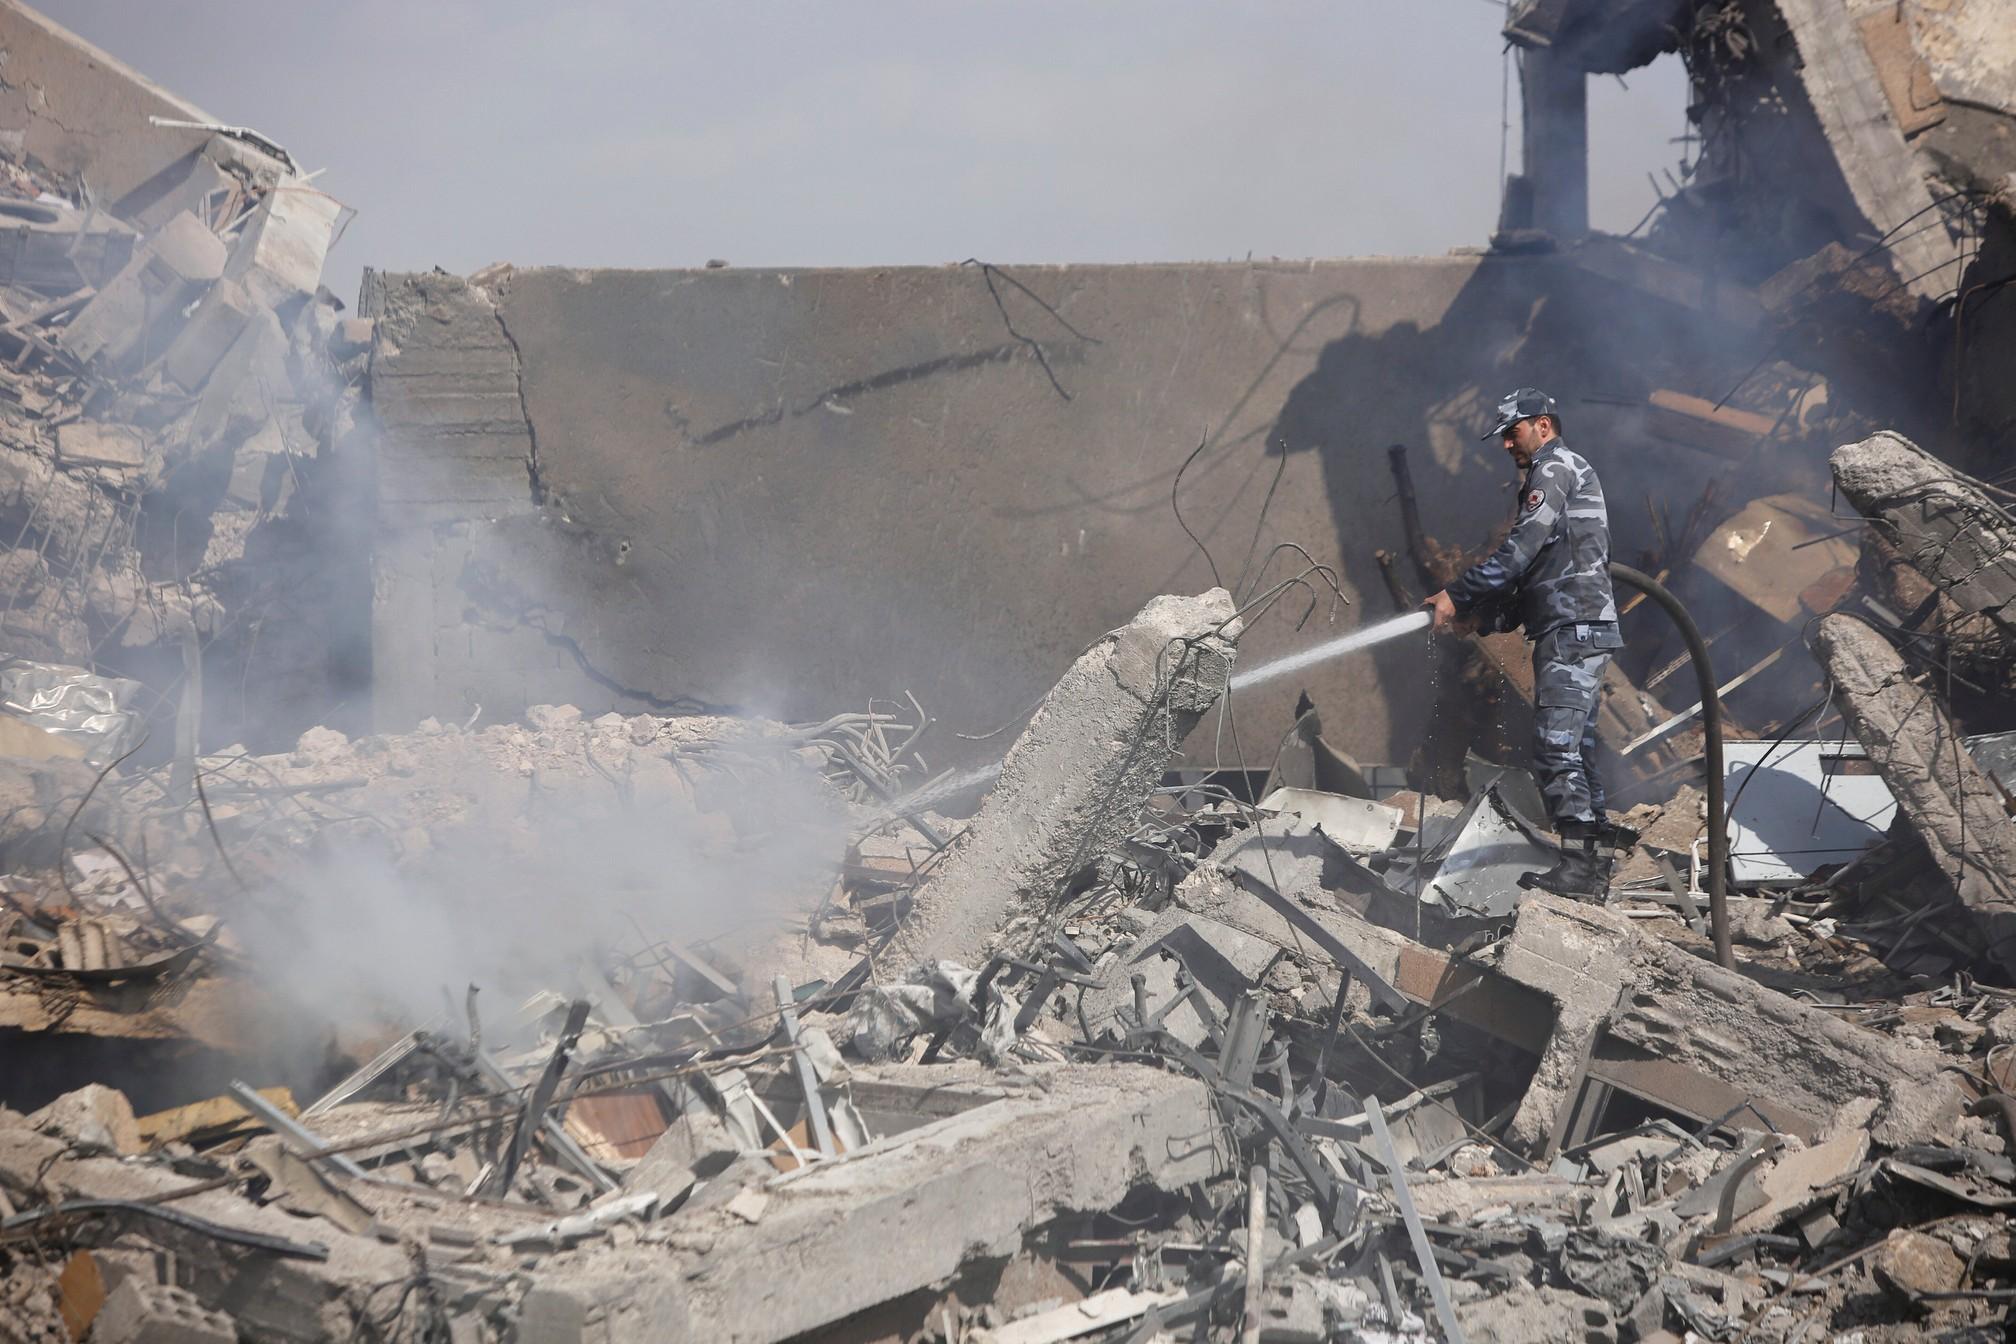 2018-04-14t144407z-1404096363-rc14b7249810-rtrmadp-3-mideast-crisis-syria.jpg